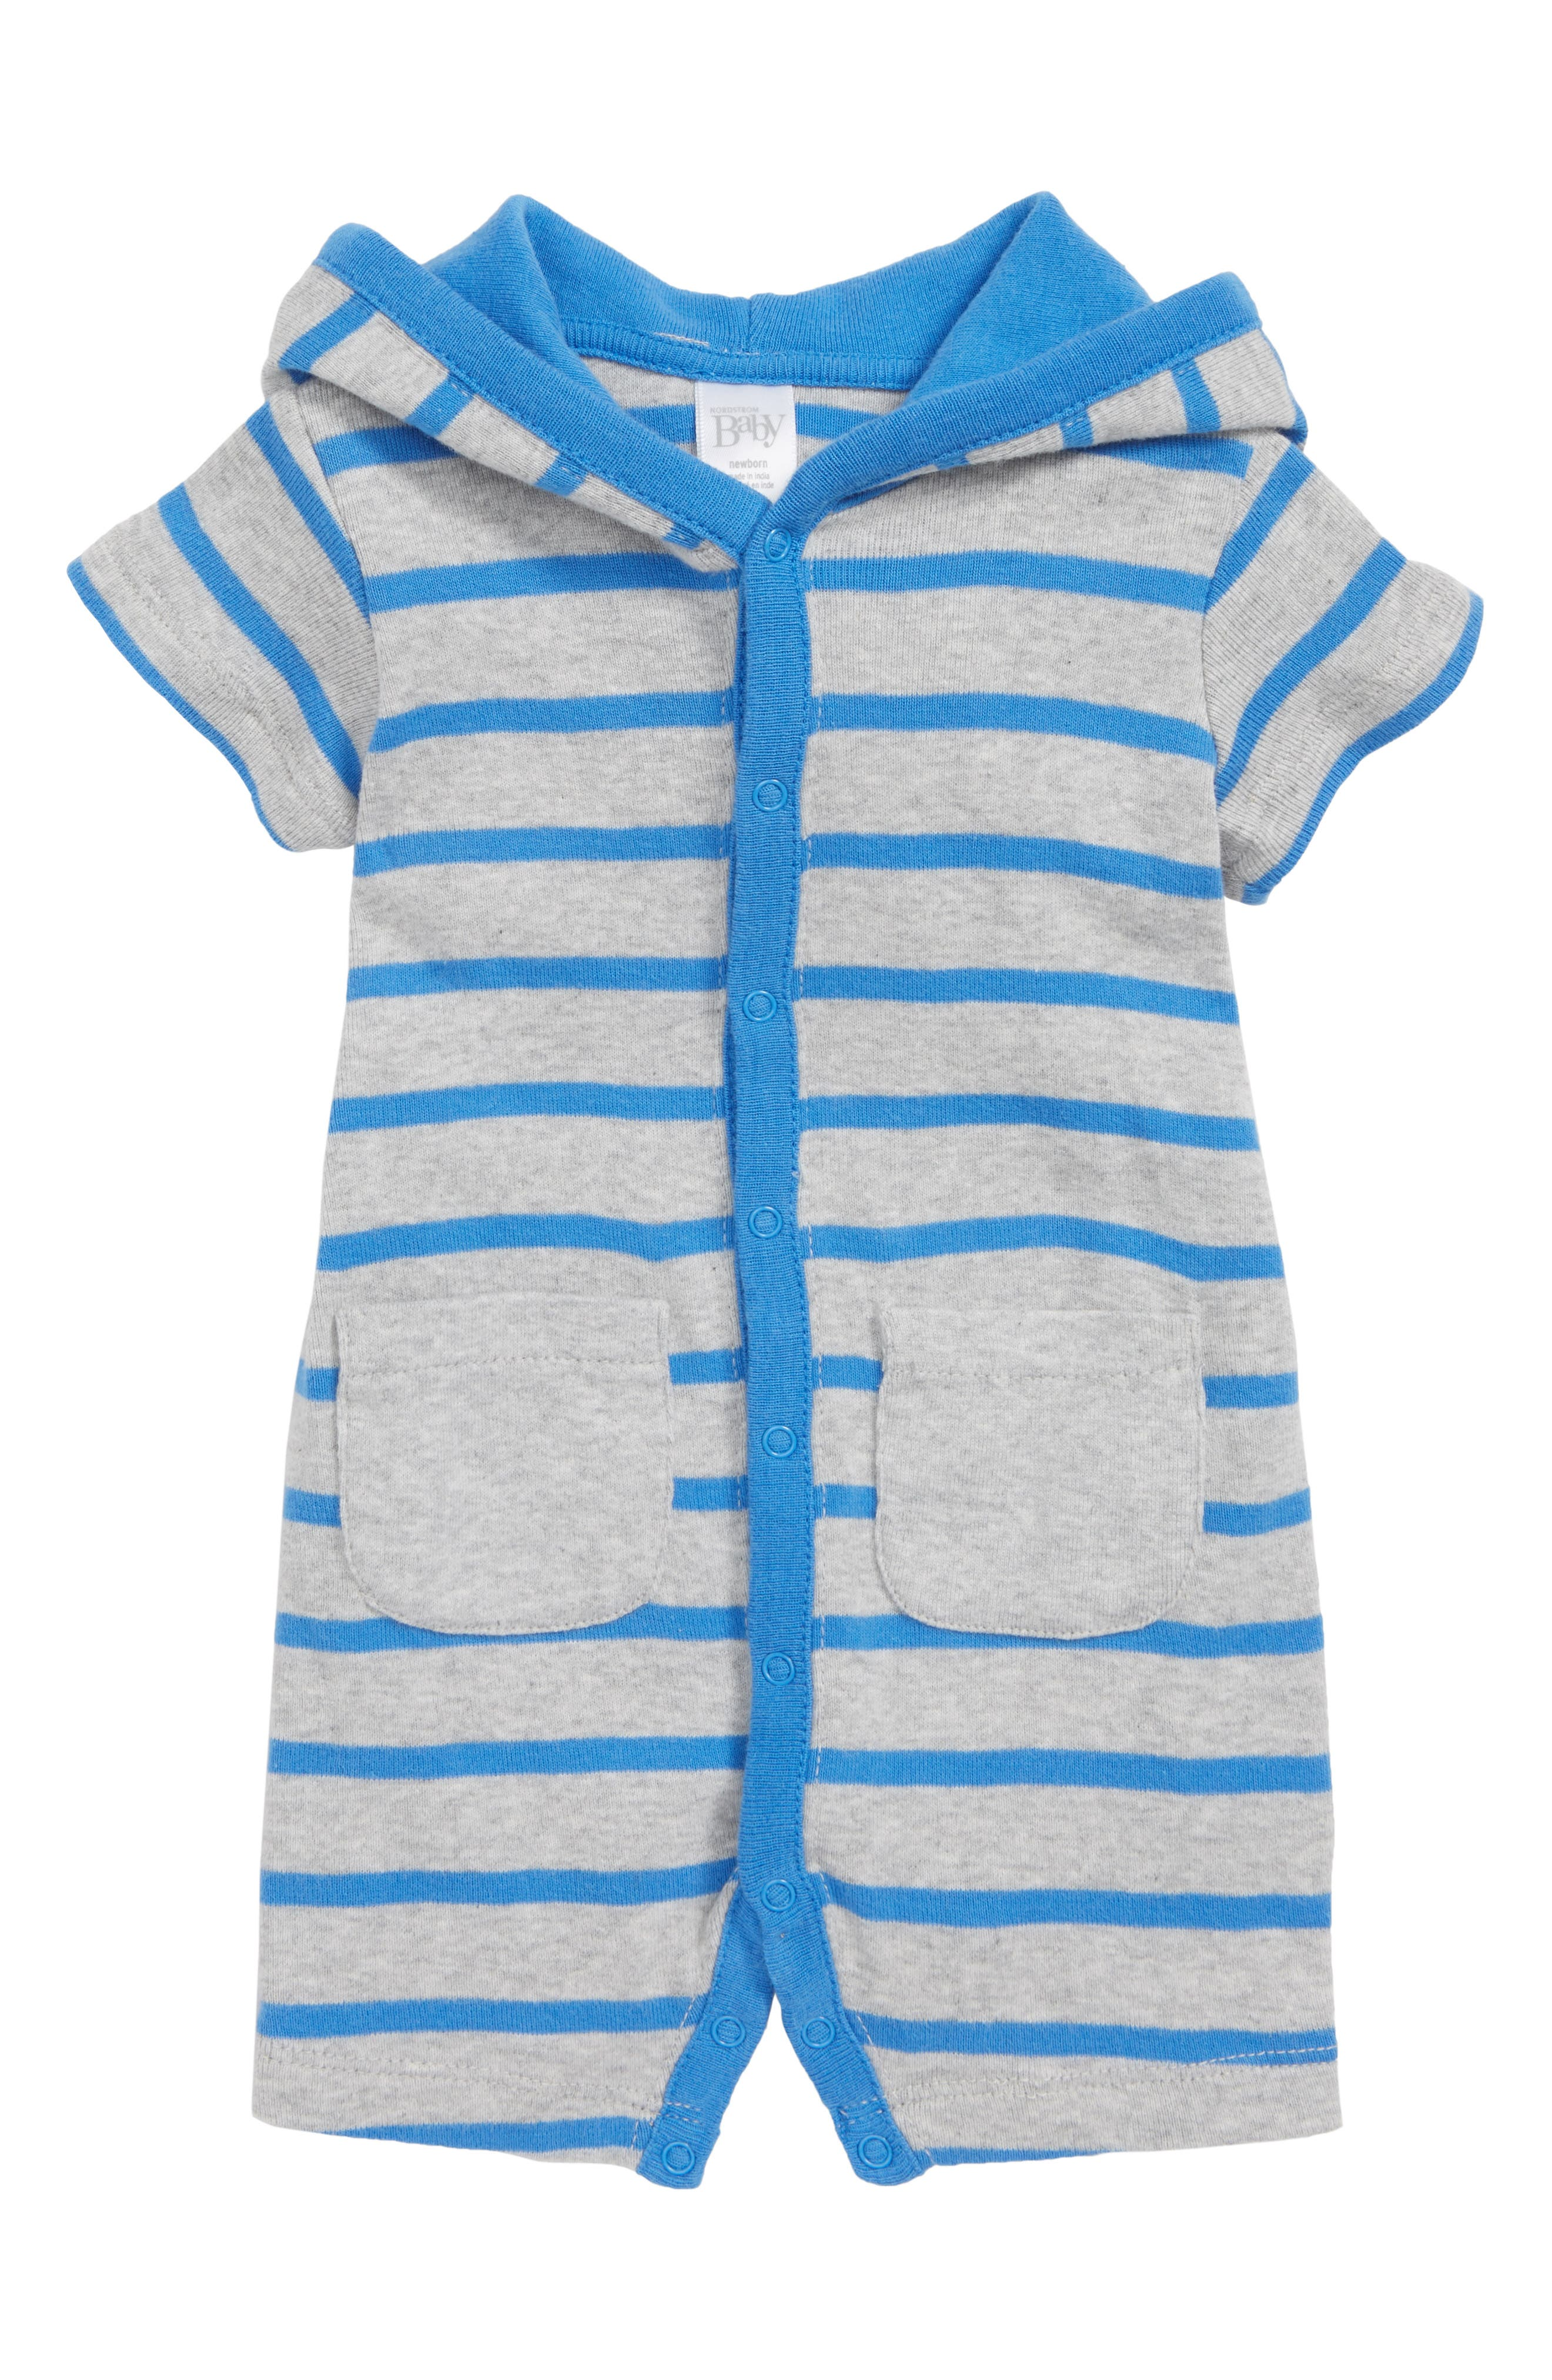 NORDSTROM BABY Stripe Hooded Romper, Main, color, 451